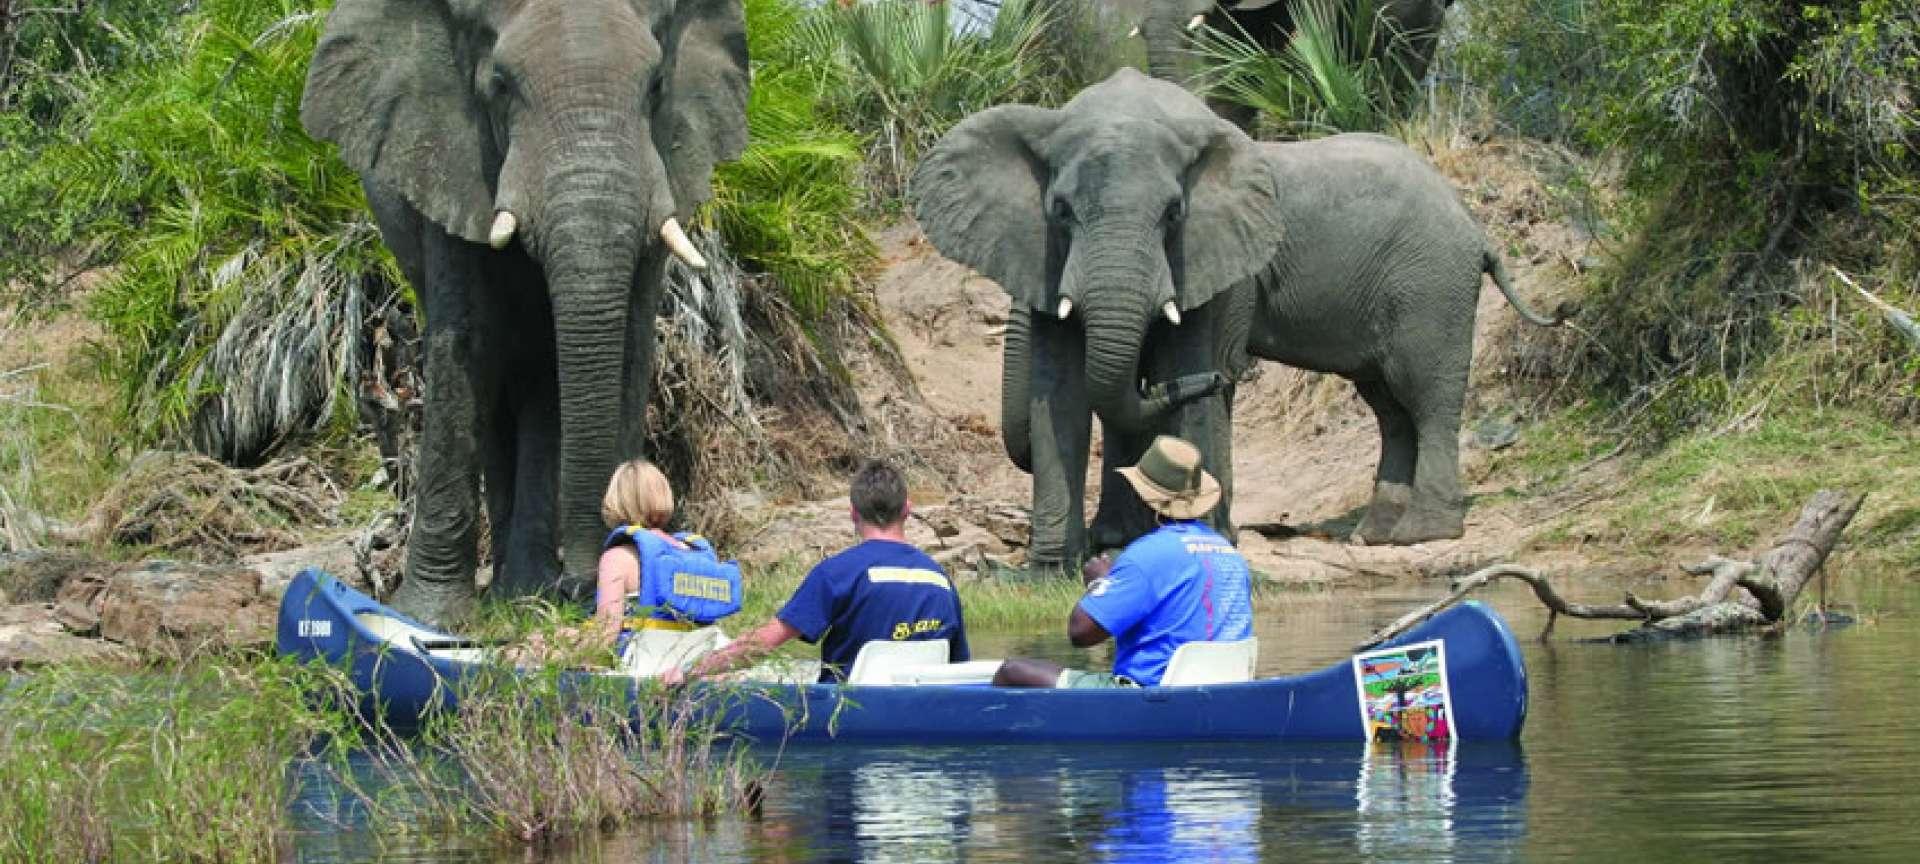 Upper Zambezi River - Africa Wildlife Safaris